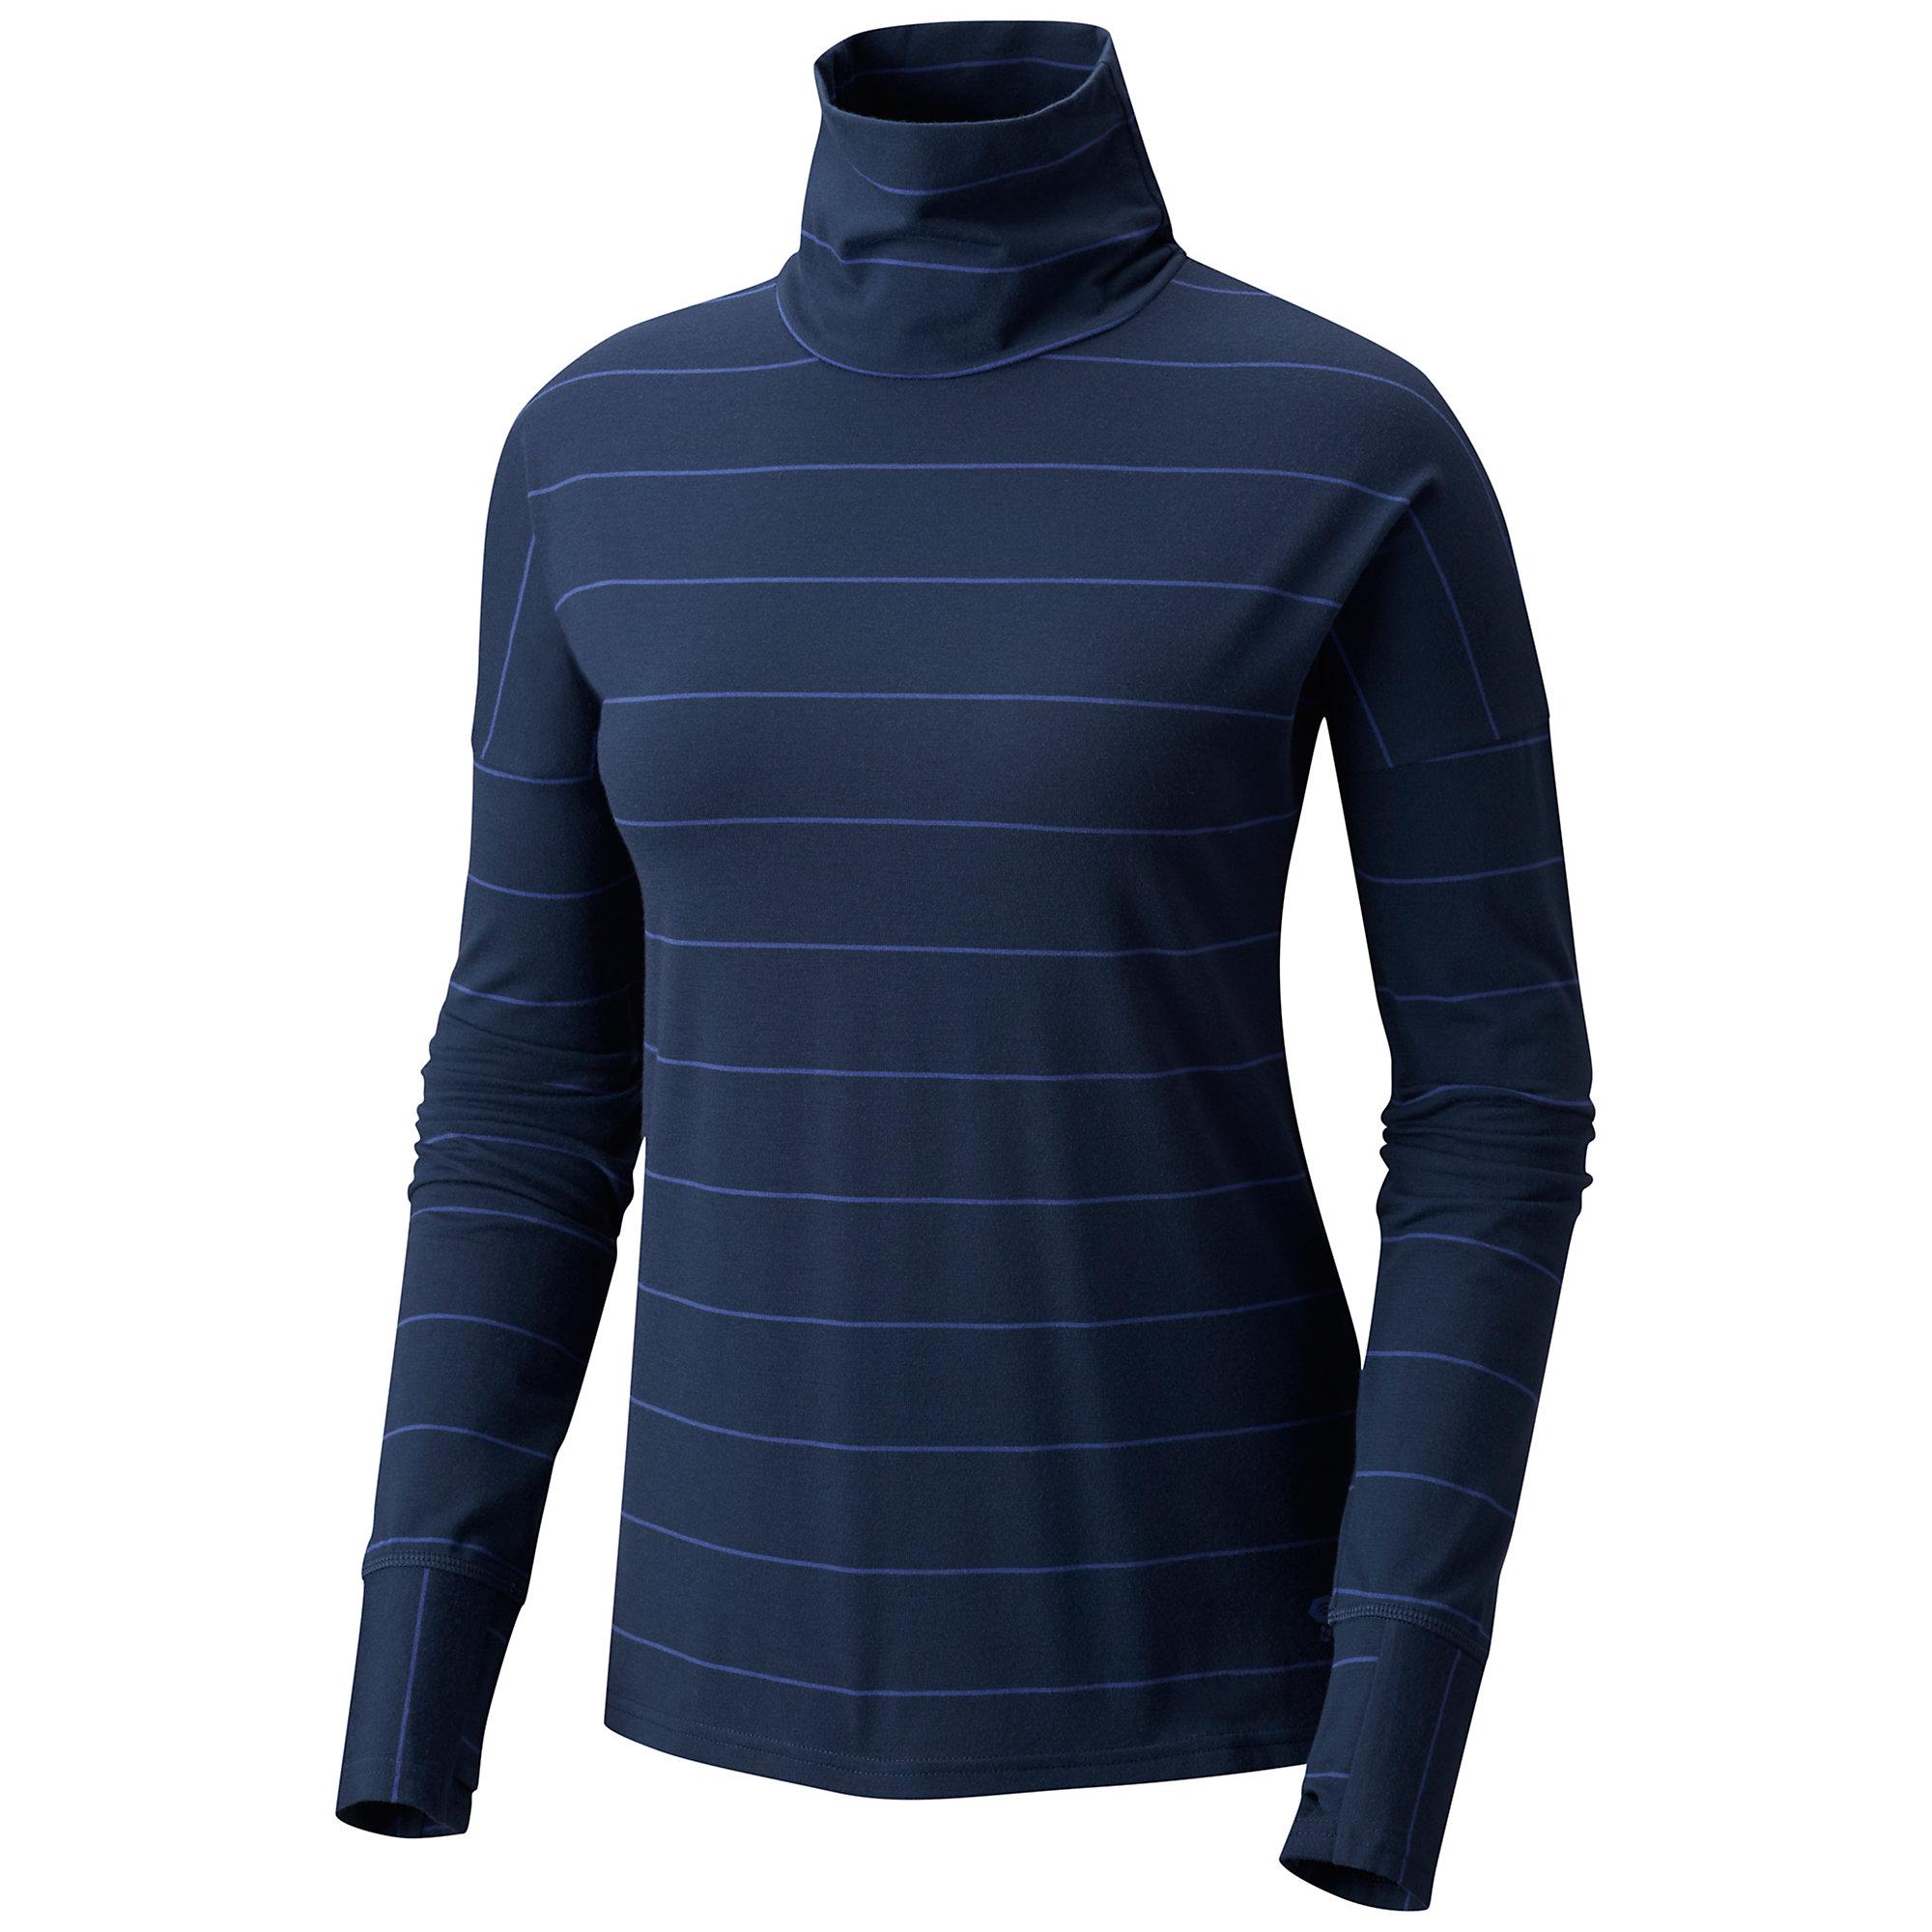 Domain Denim Shirt Tops